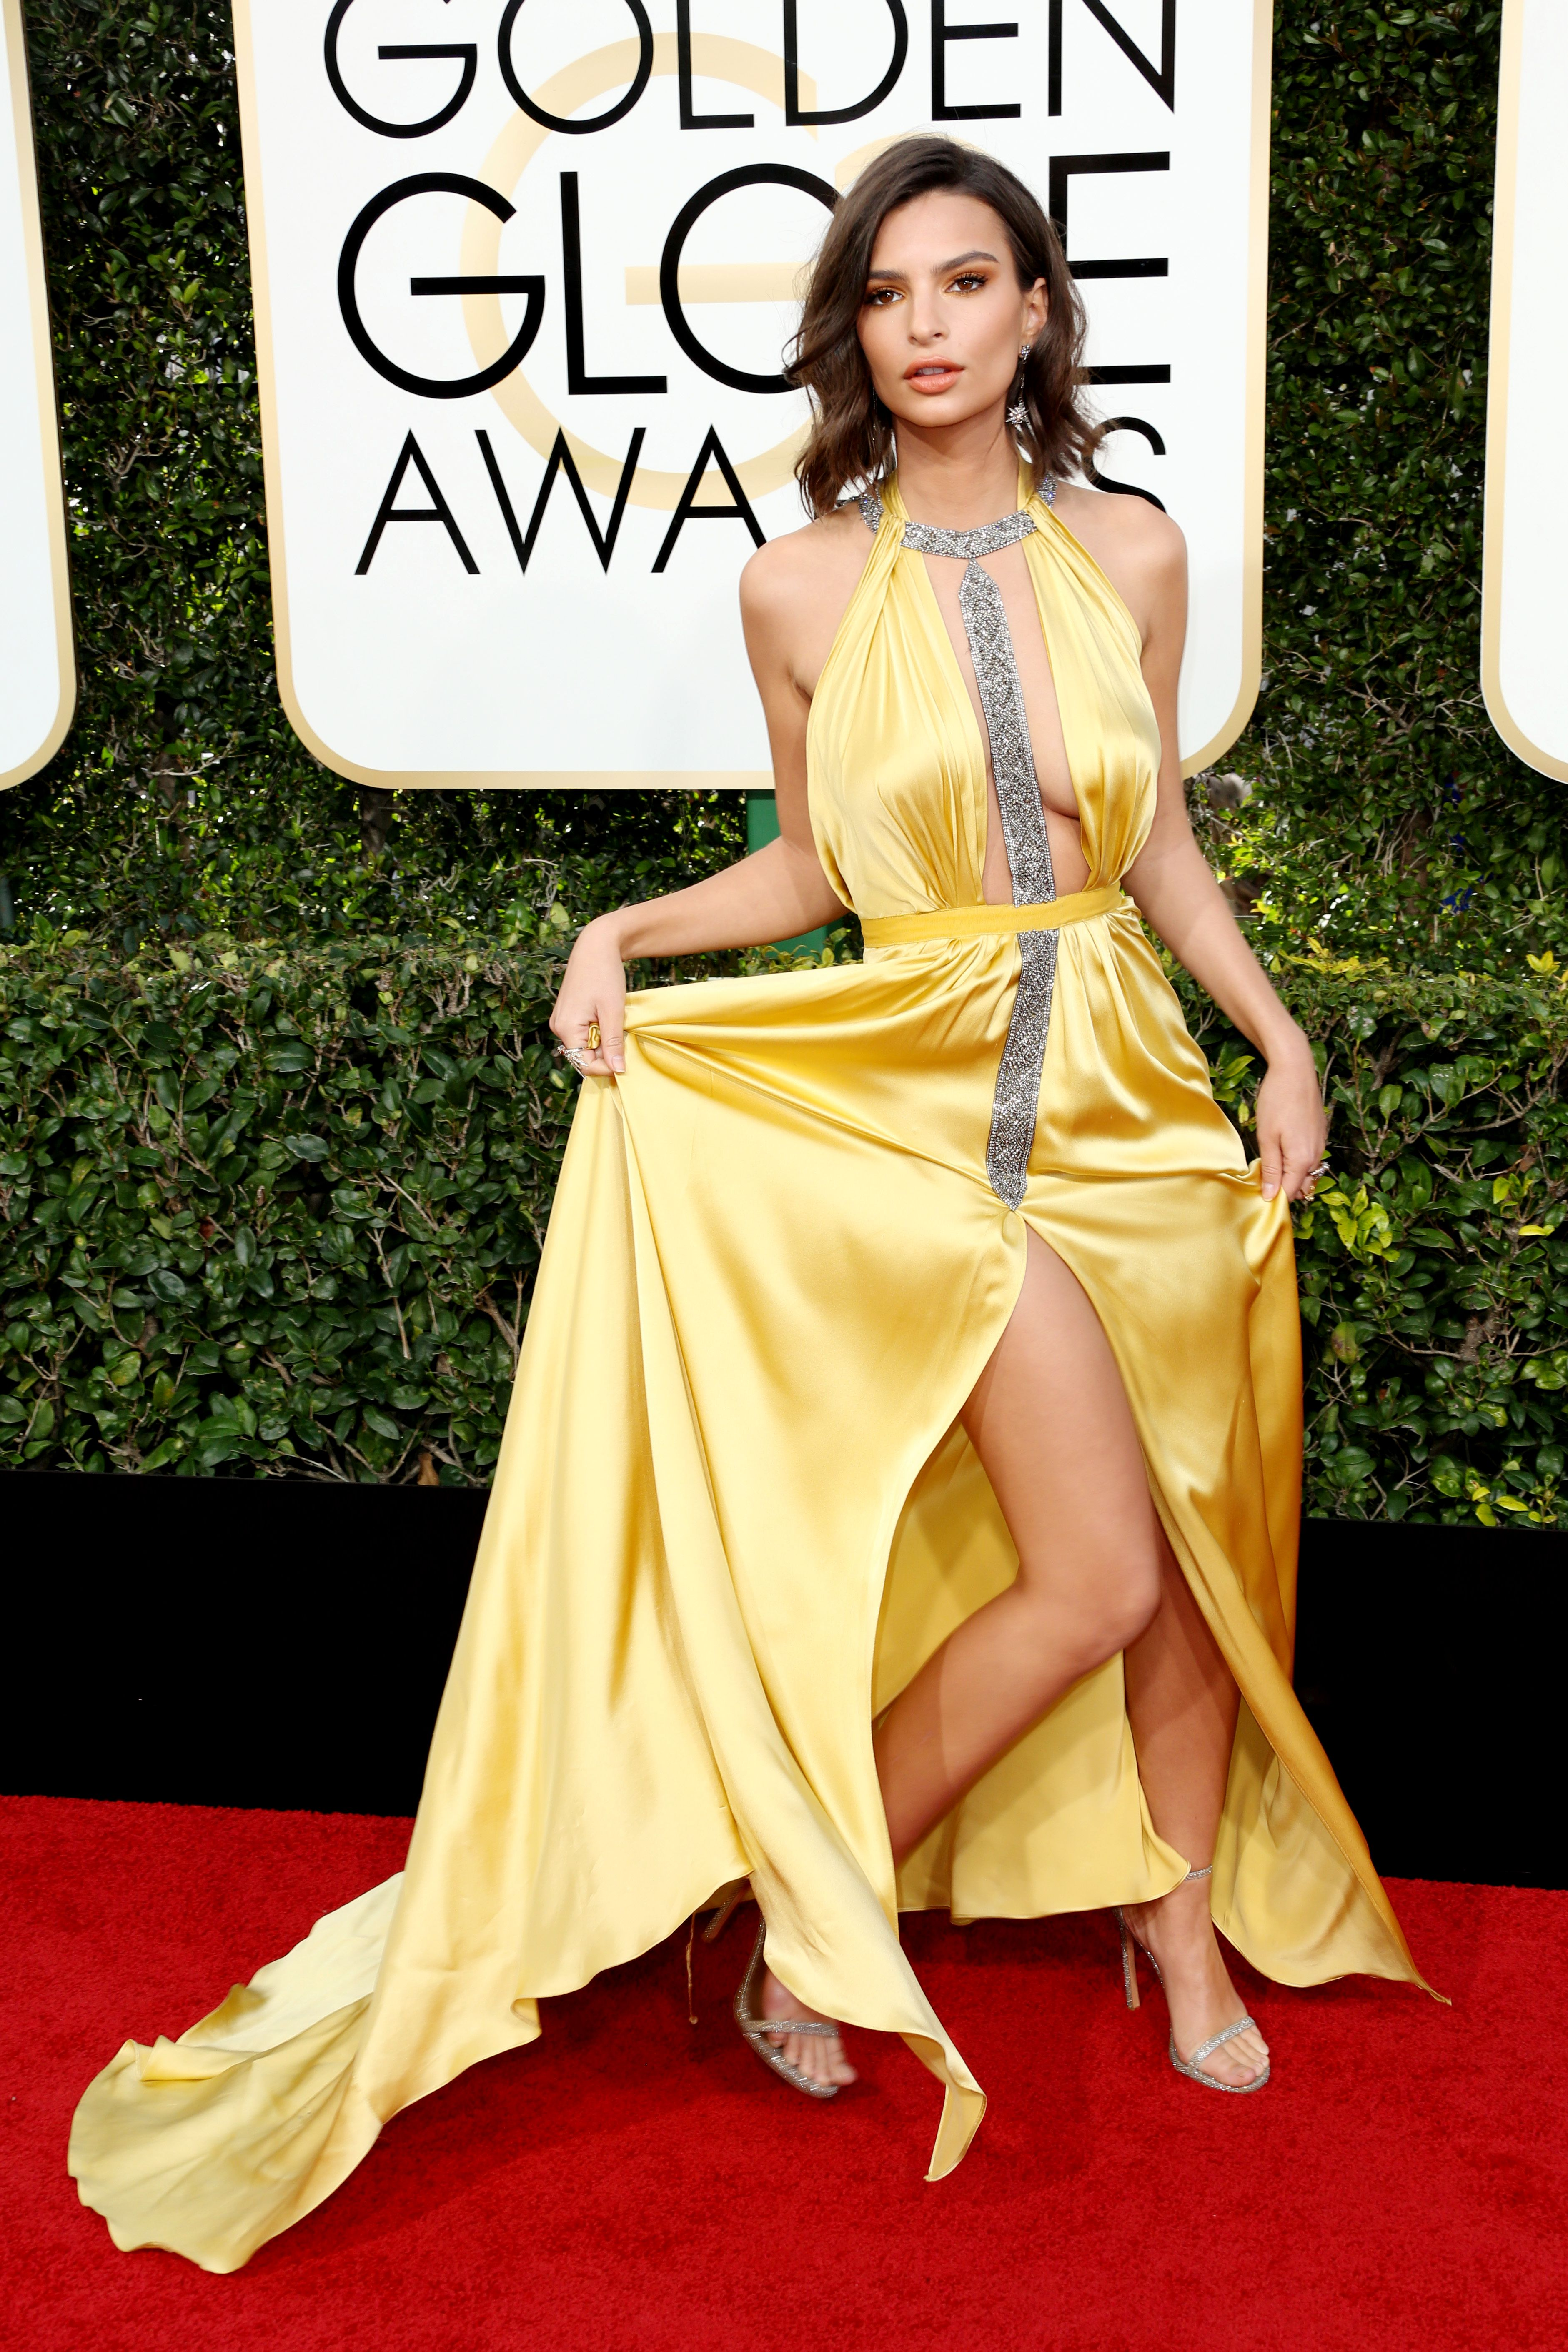 Emily Ratajkowski, Golden Globes. Mandatory Credit: Photo by BEI/Shutterstock